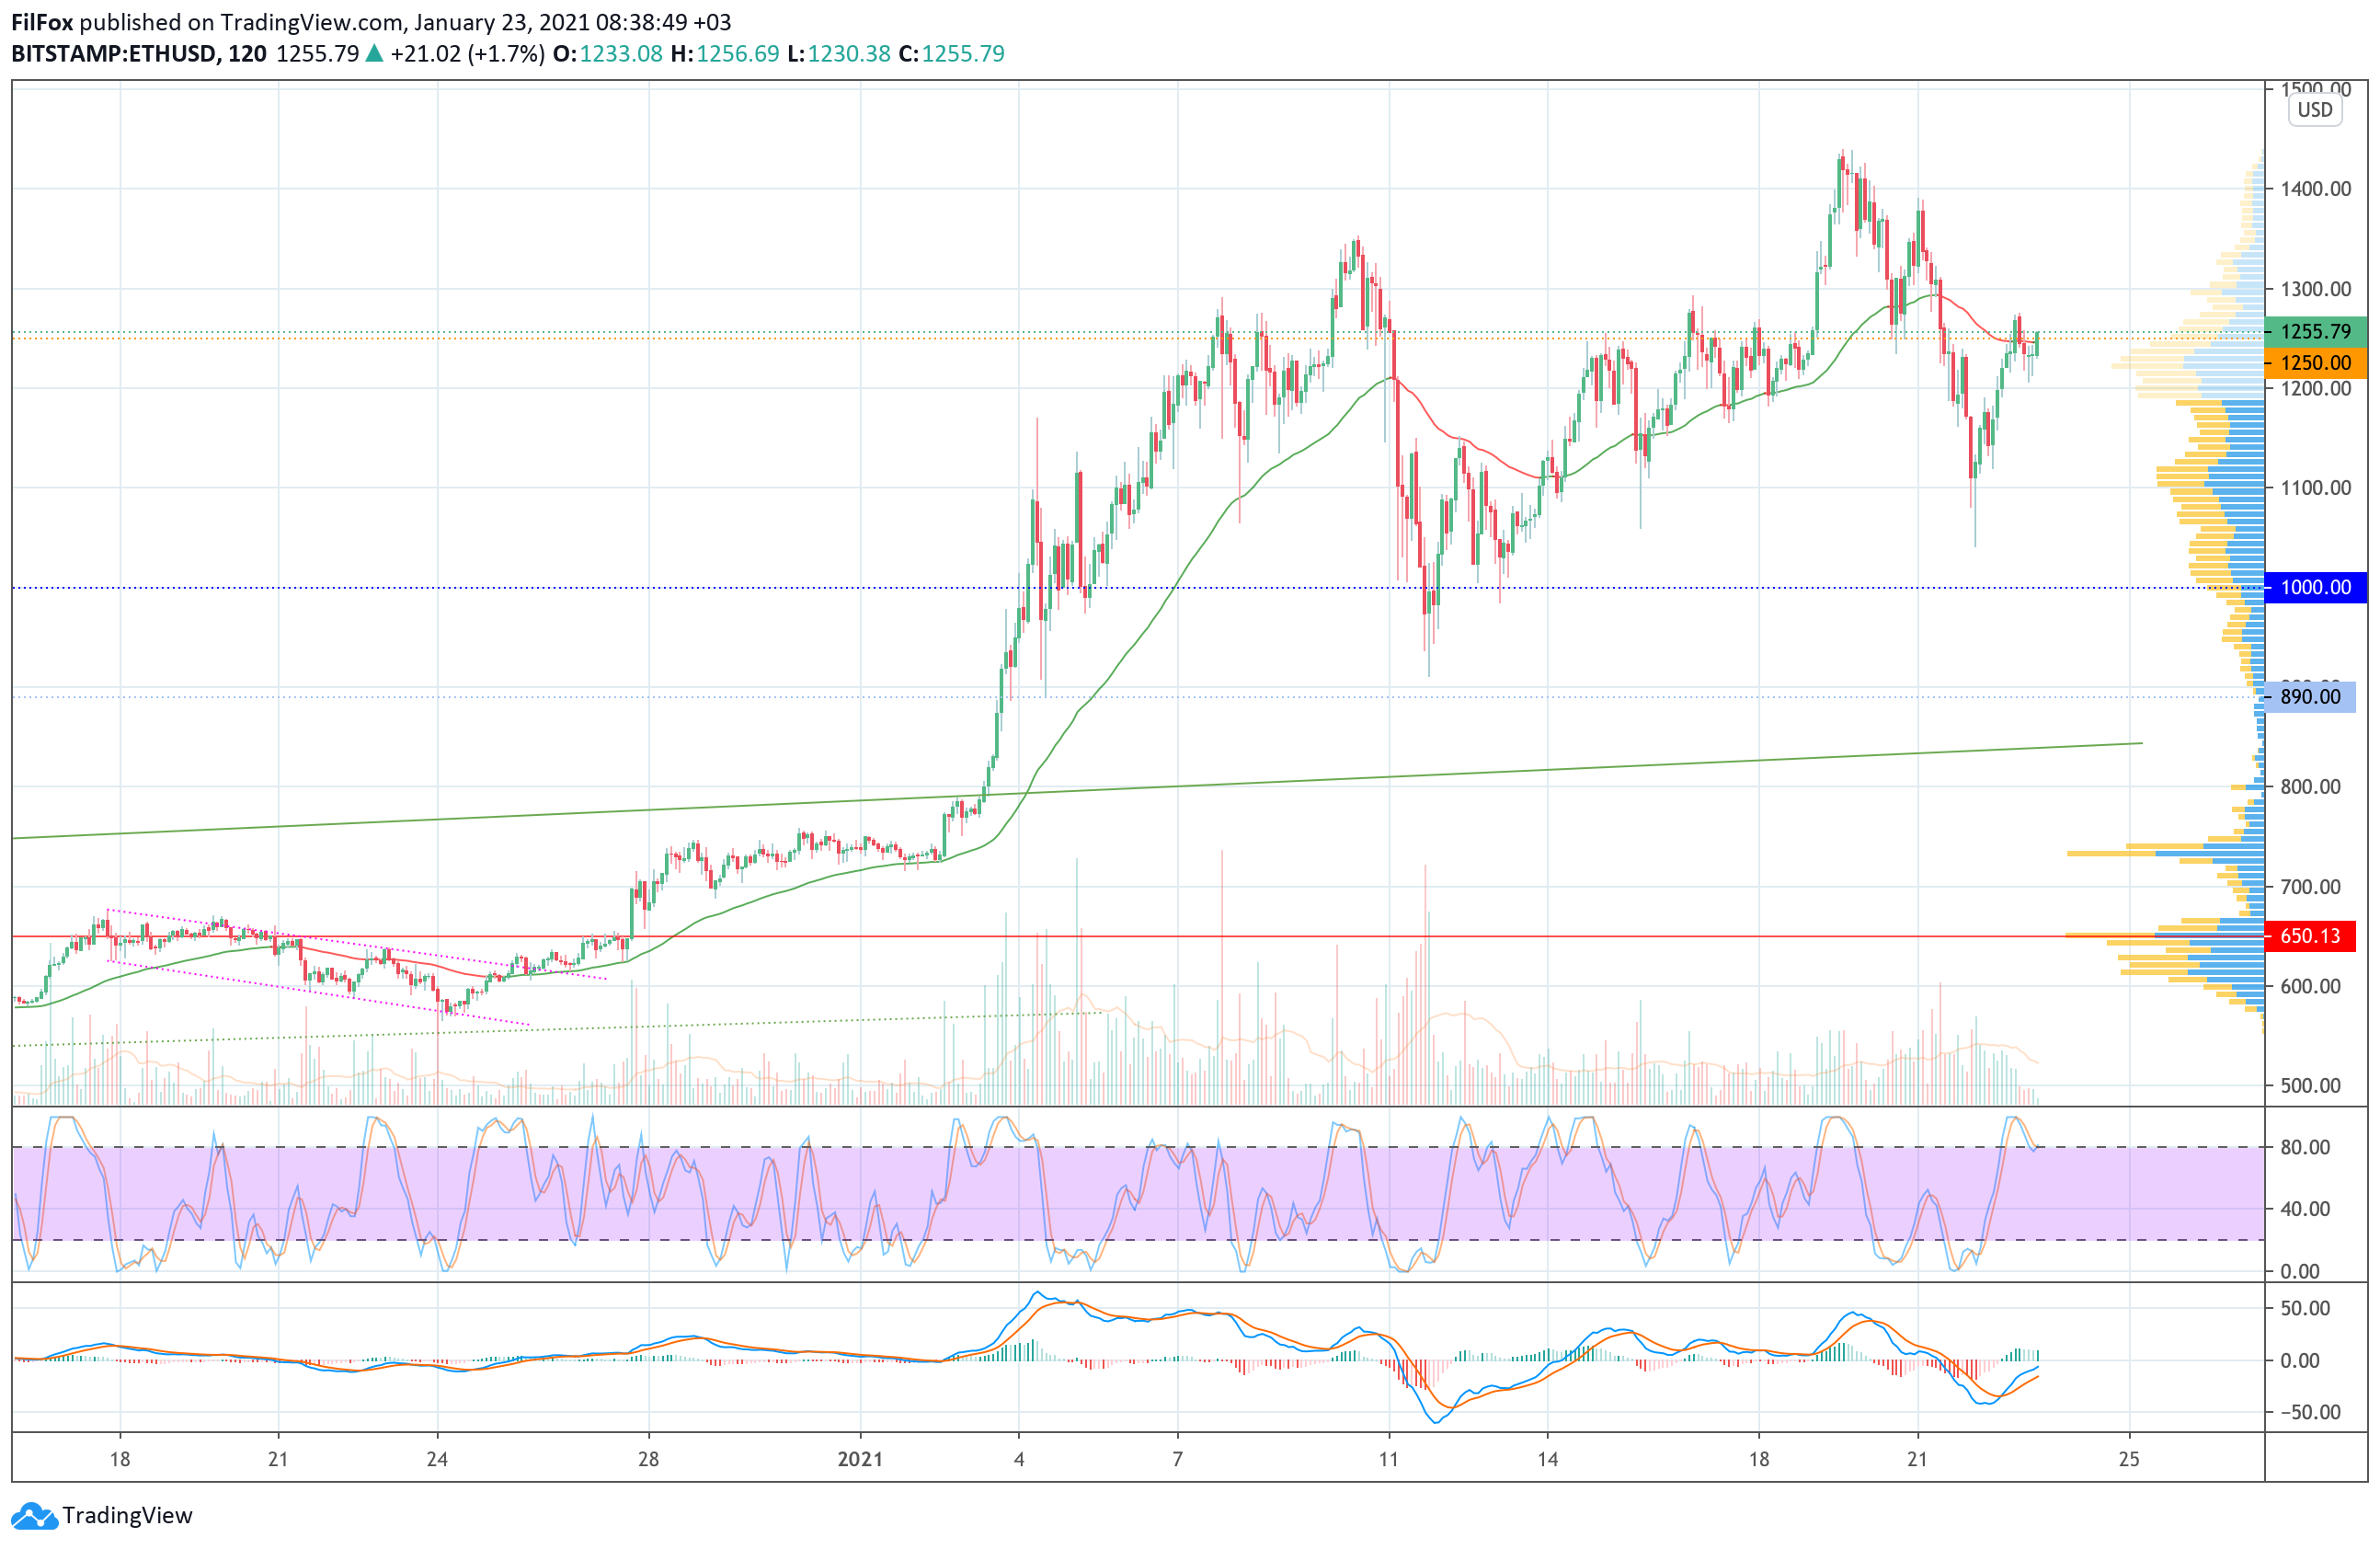 Анализ цен Bitcoin, Ethereum, Ripple на 23.01.2021